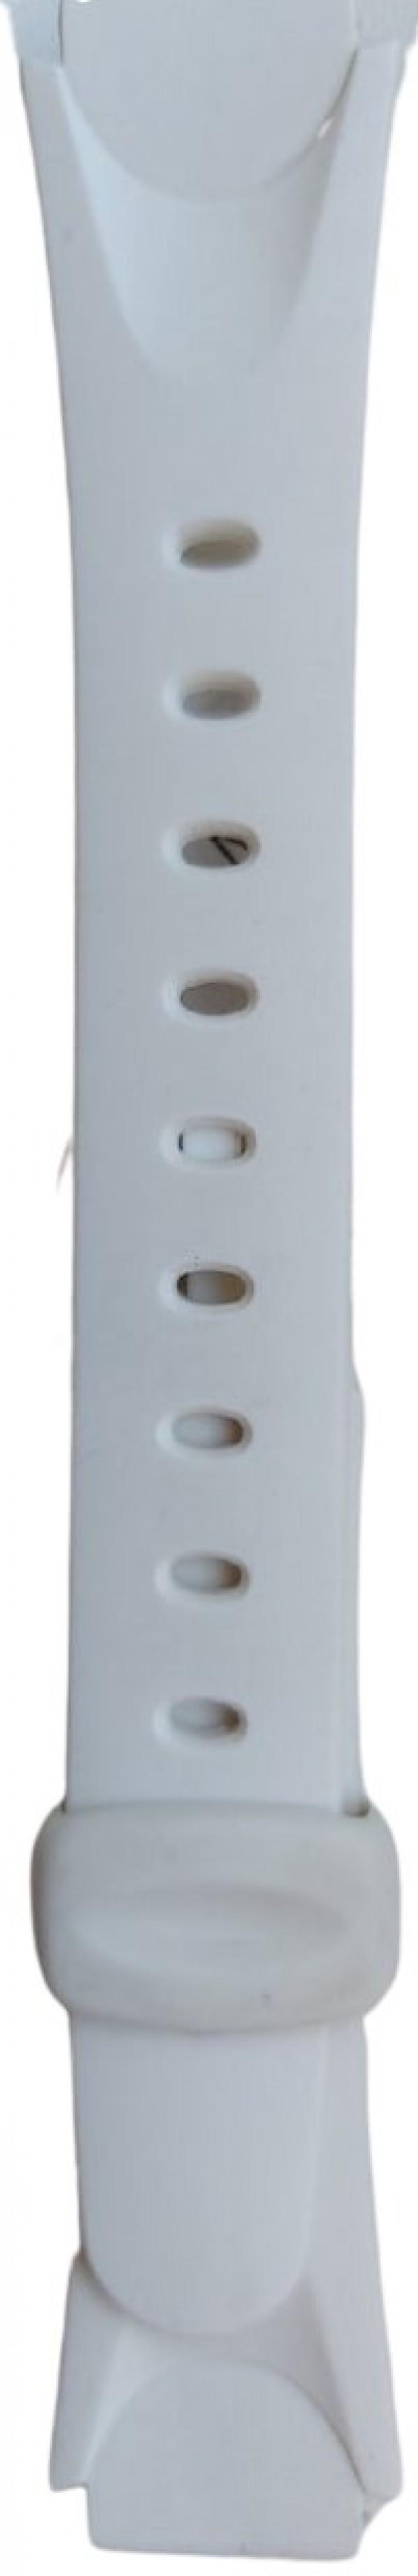 Casio kaiš LW-200-7A